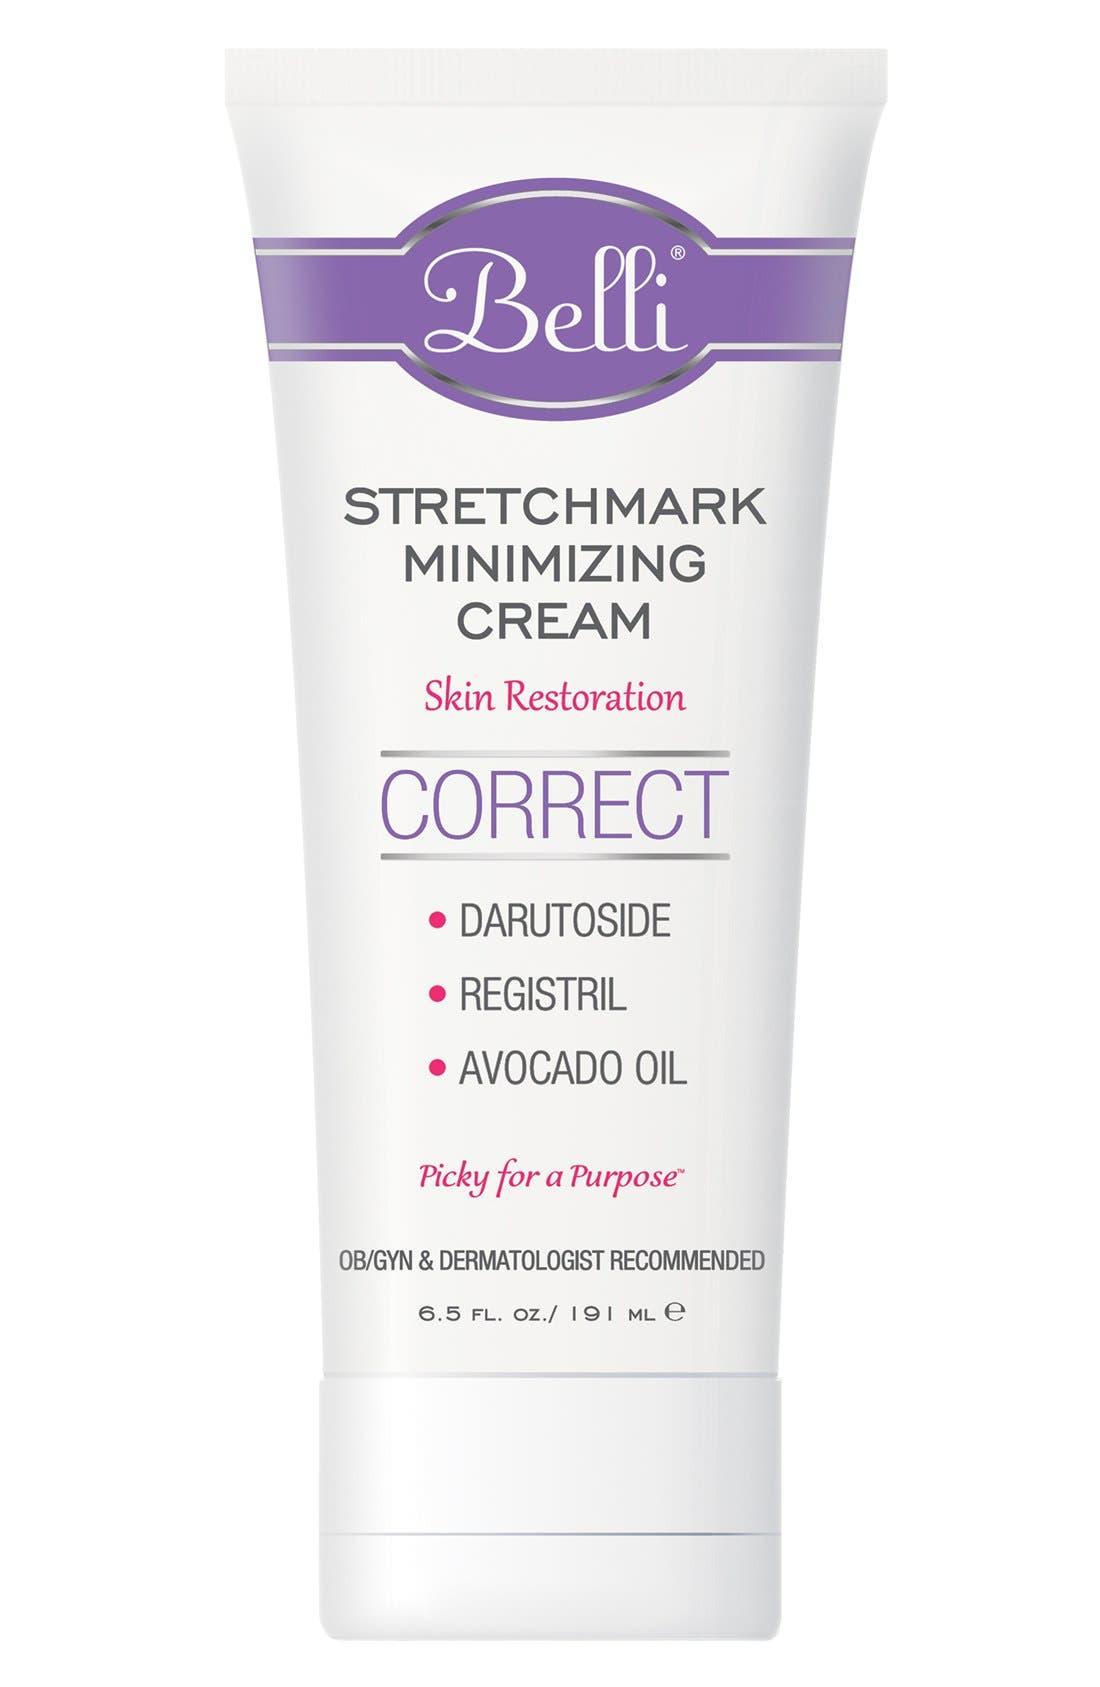 Belli Skincare Maternity Stretchmark Minimizing Cream for Skin Restoration